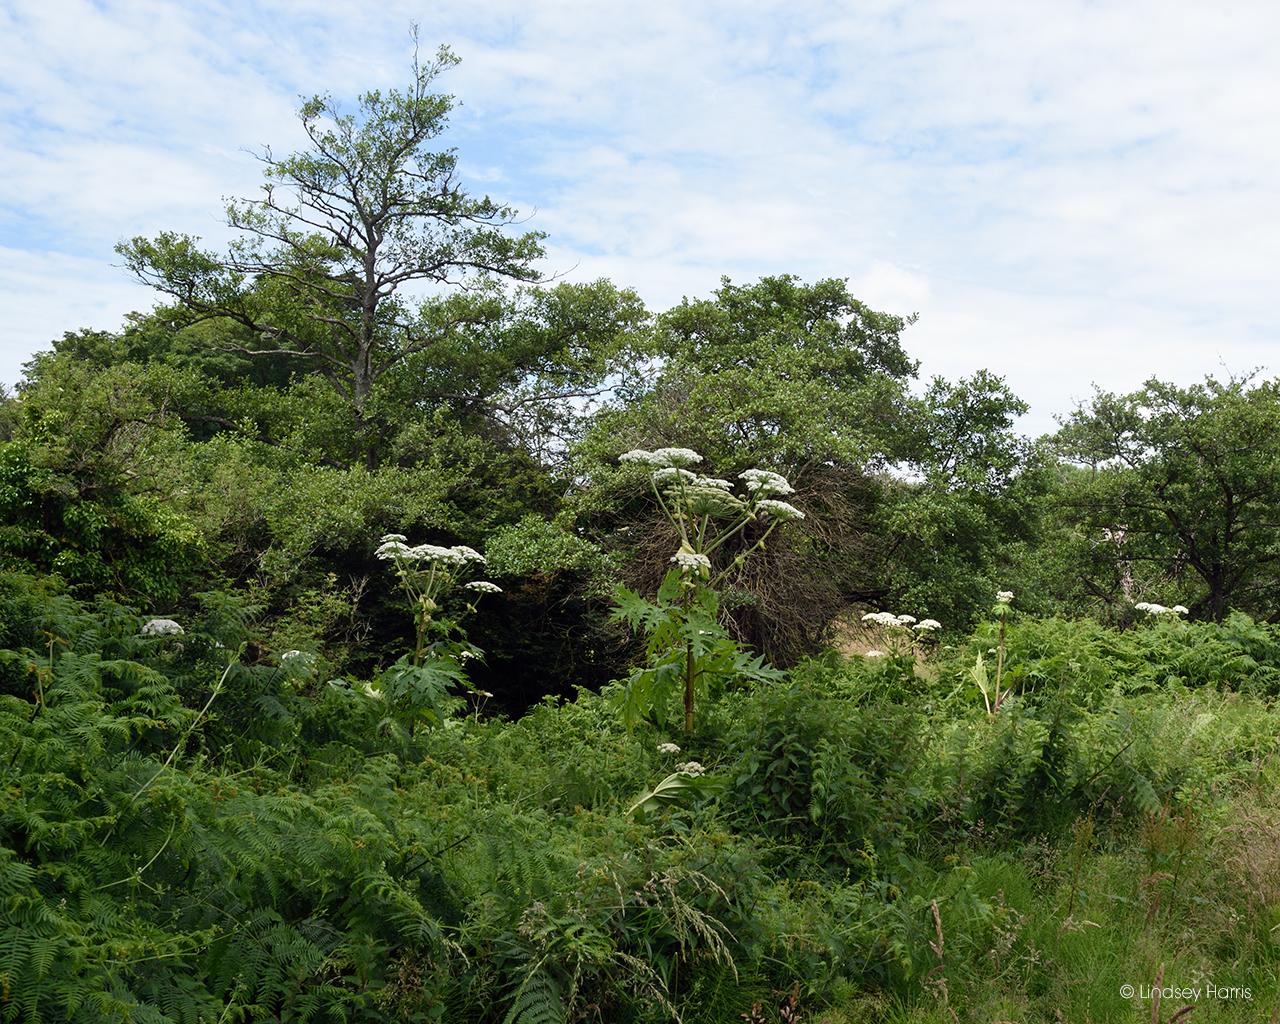 Giant hogweed plants in Dorset.